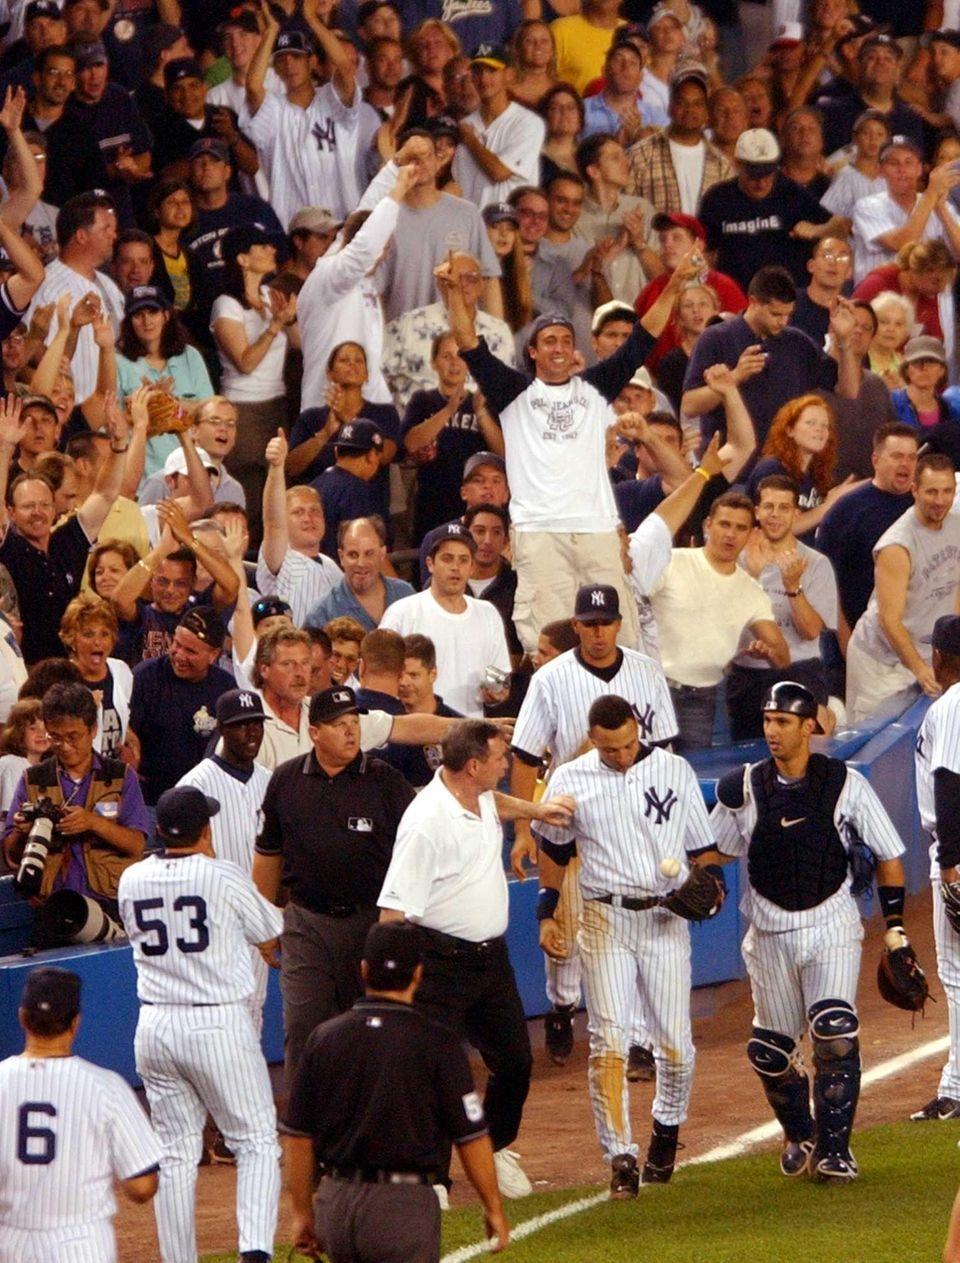 New York Yankees' Derek Jeter is escorted off